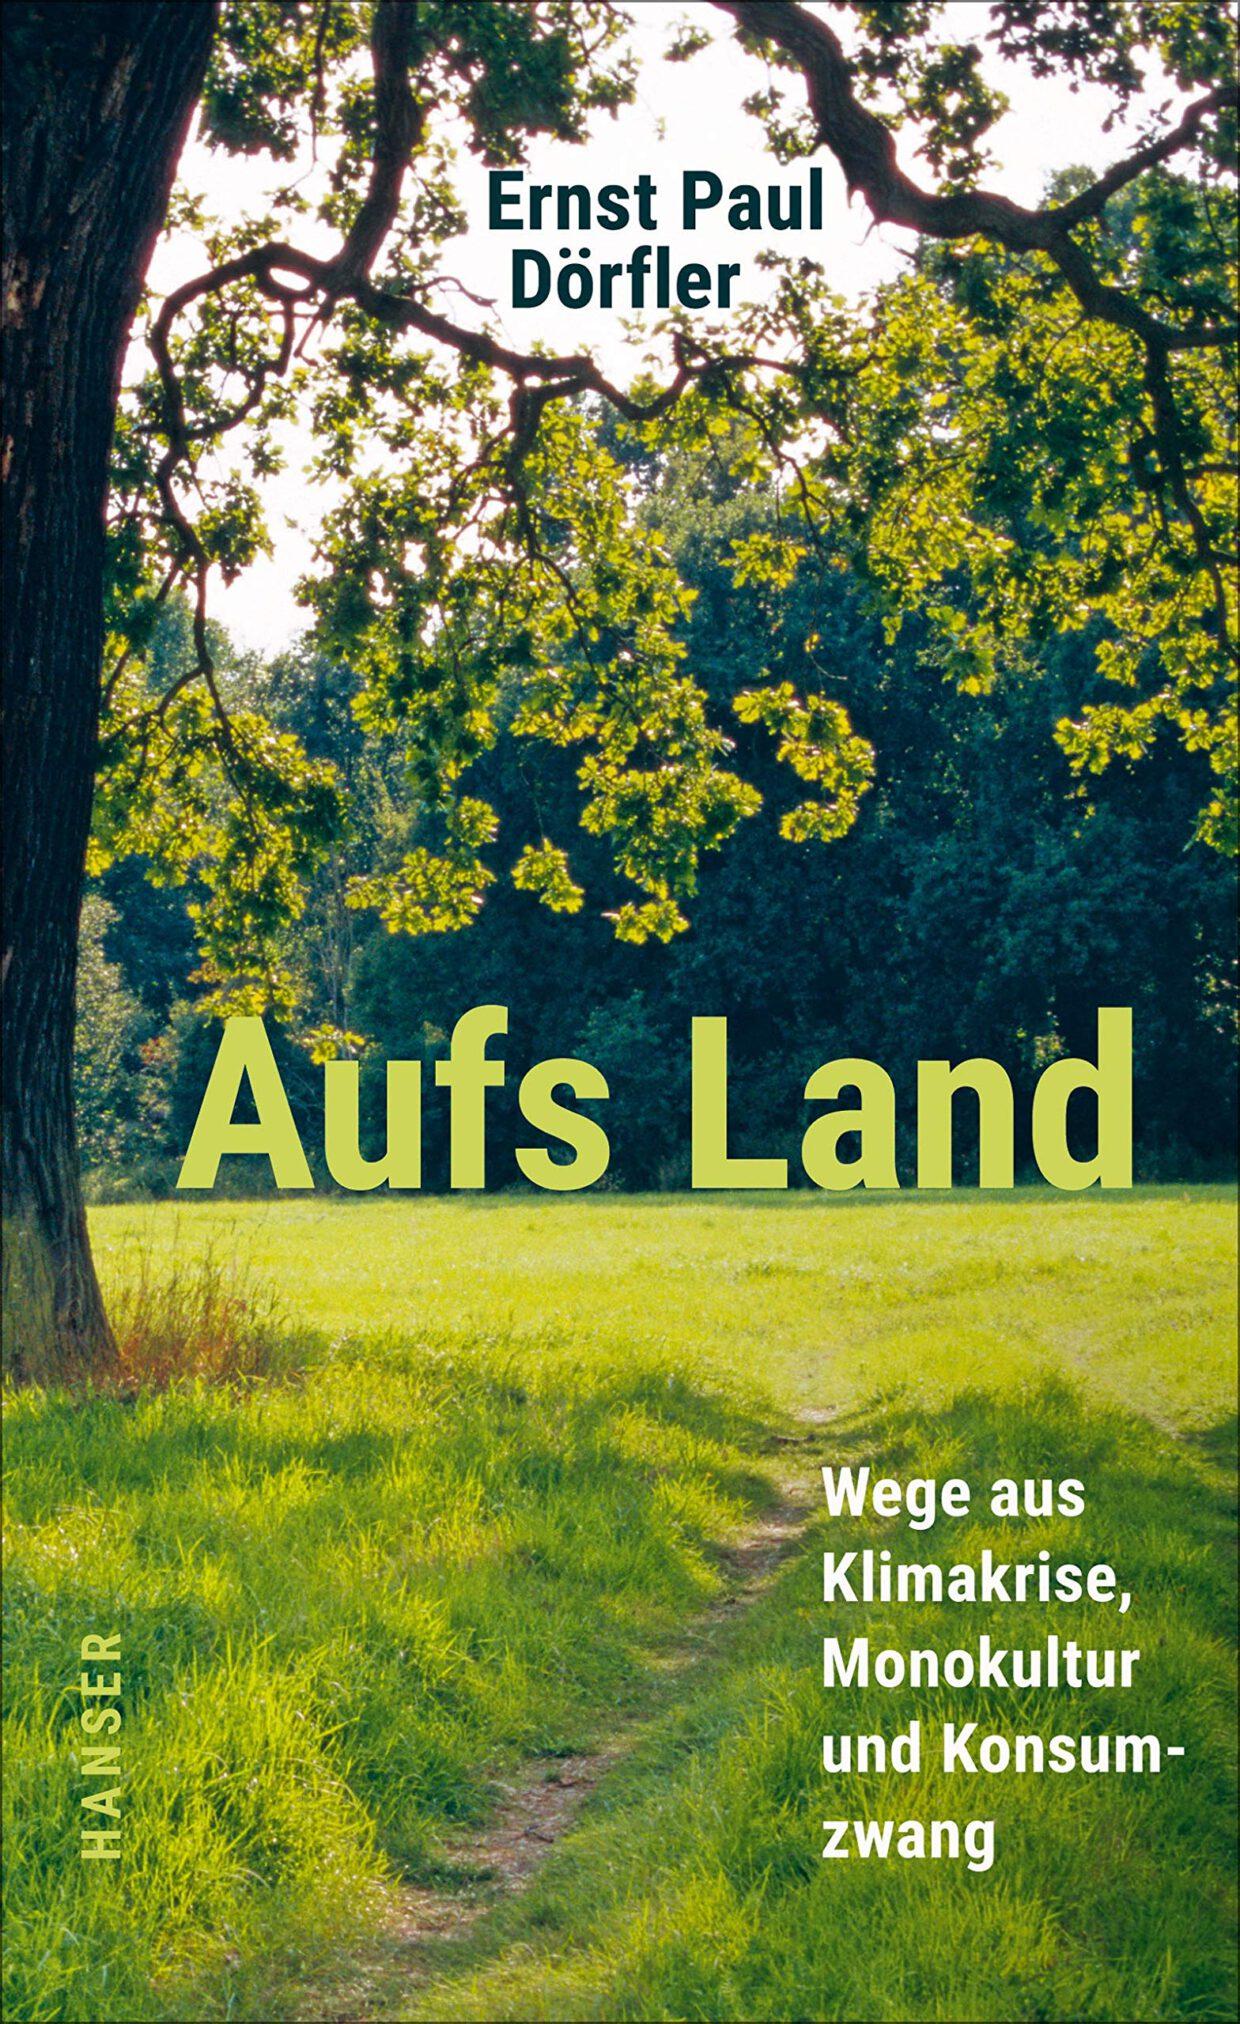 Ernst Paul Dörfler: Aufs Land